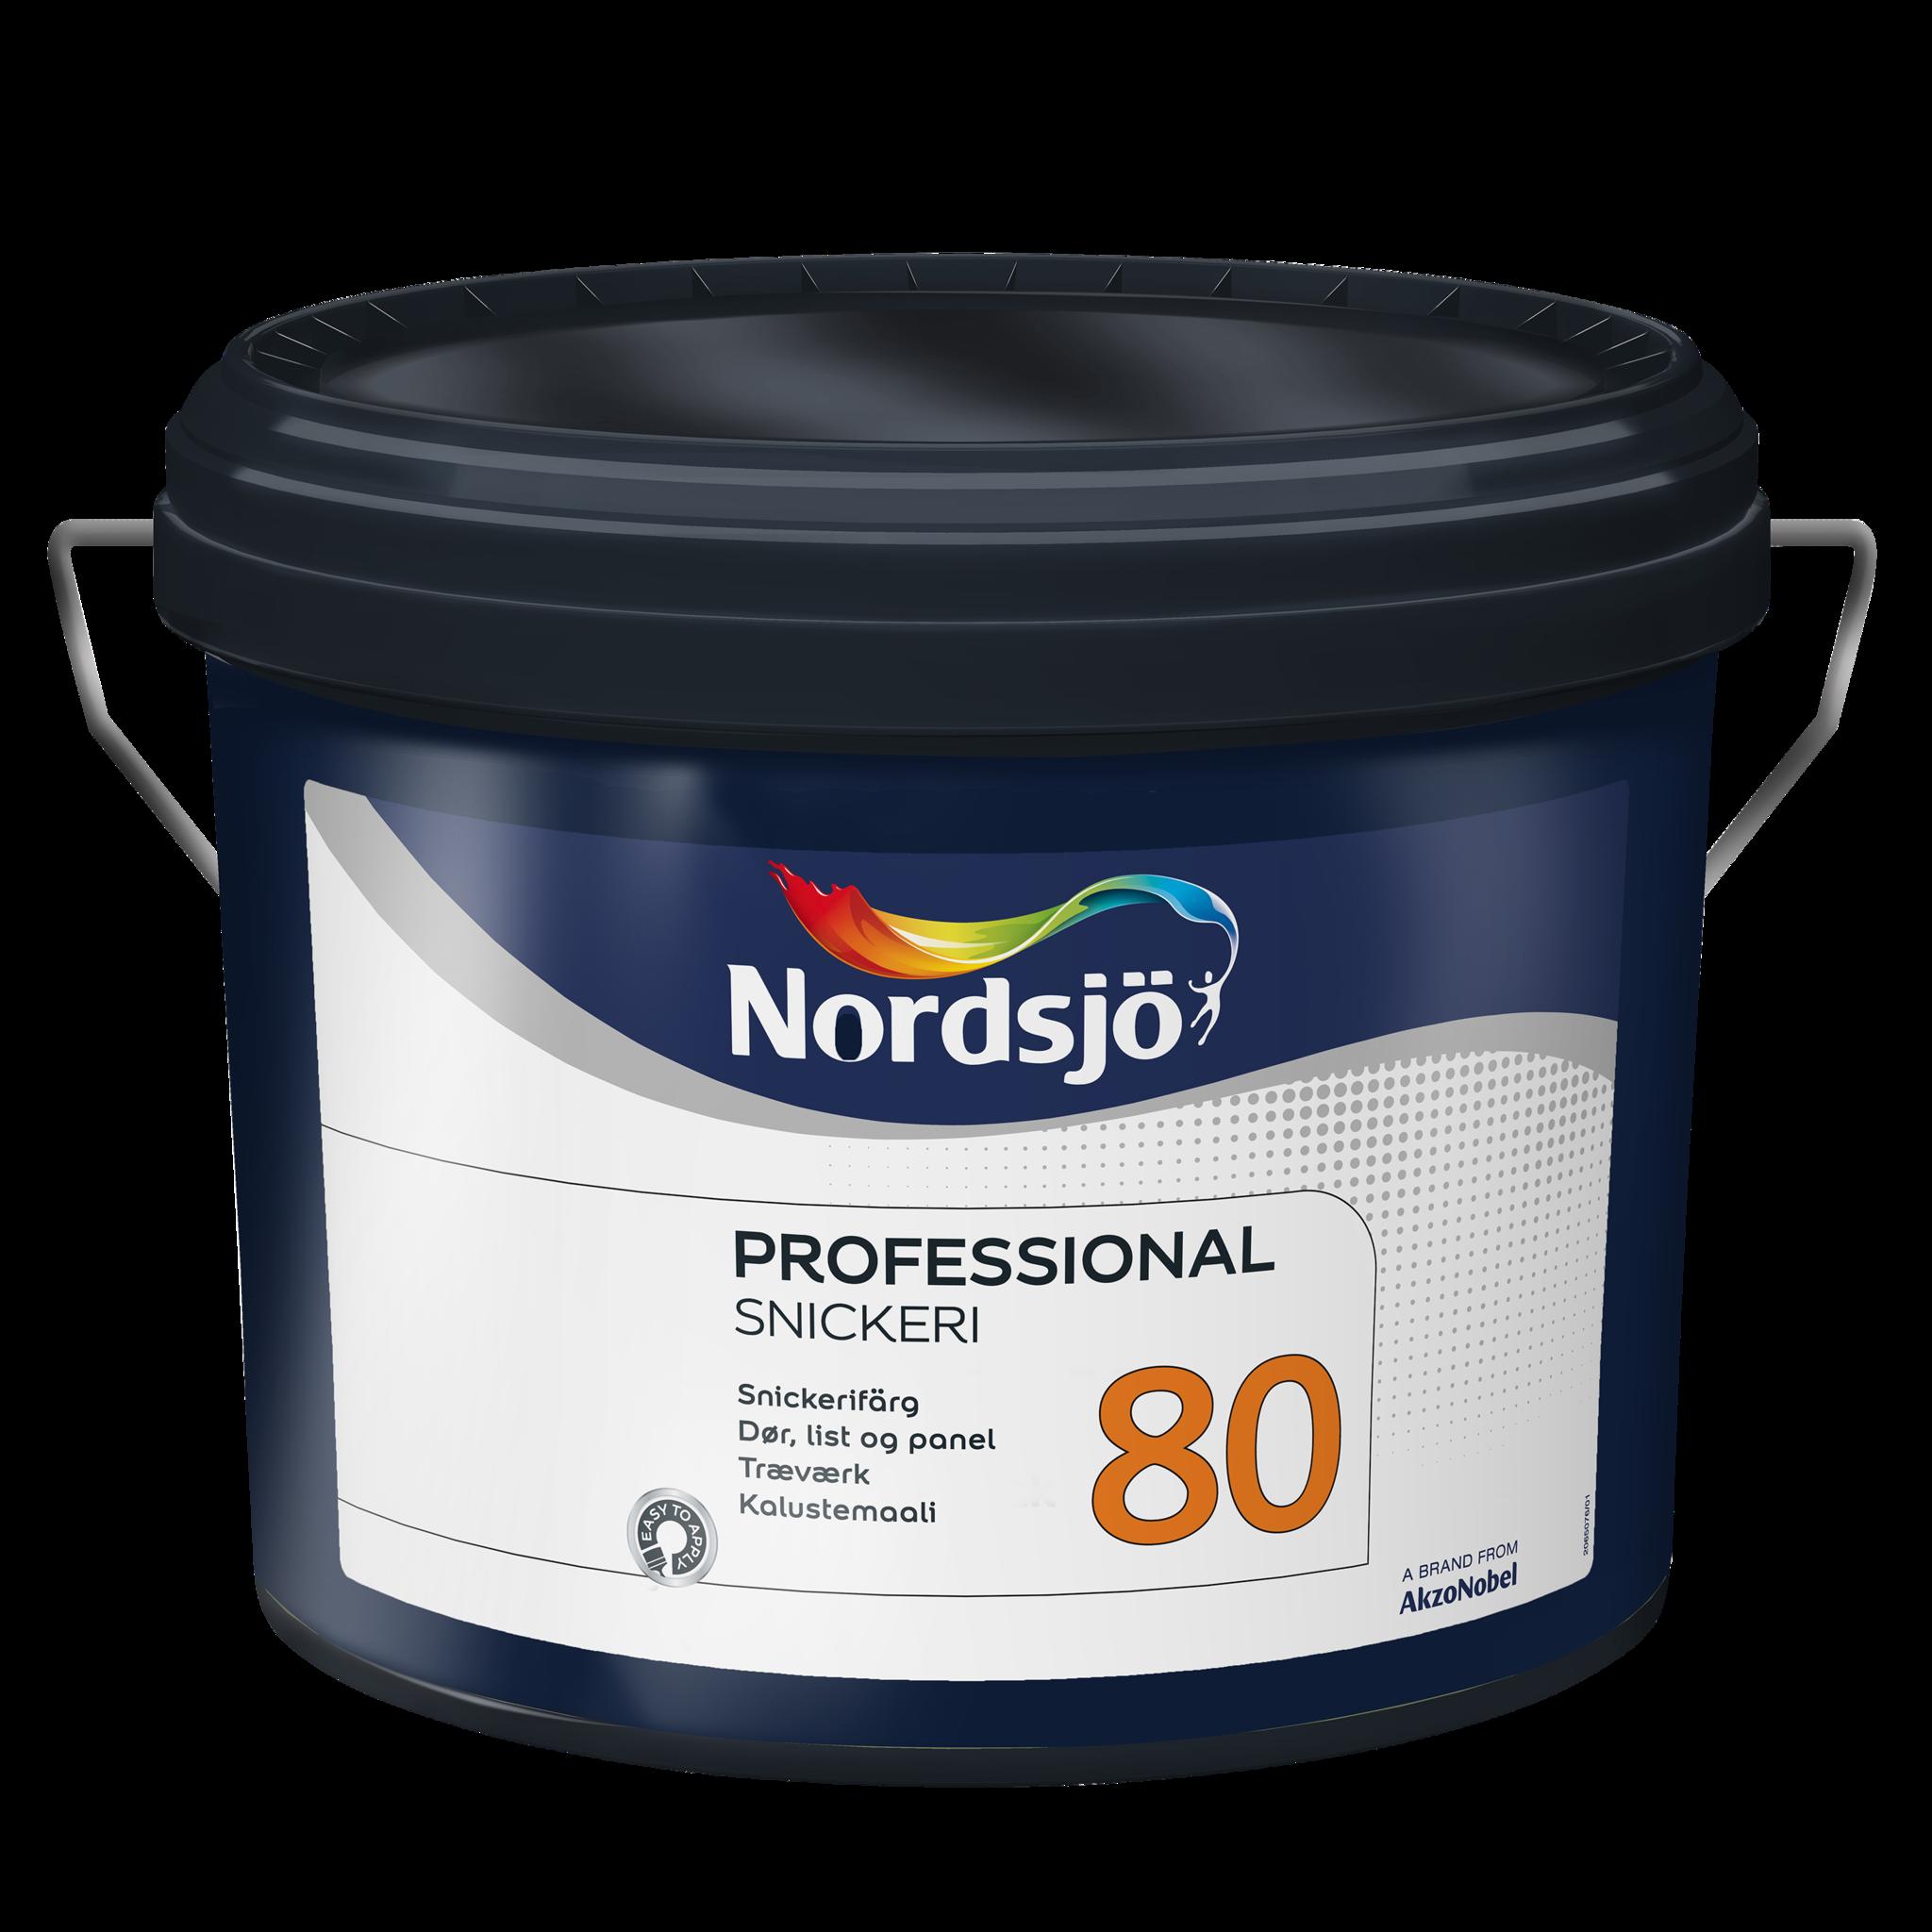 Nordsjo_Professional_Snickeri-801